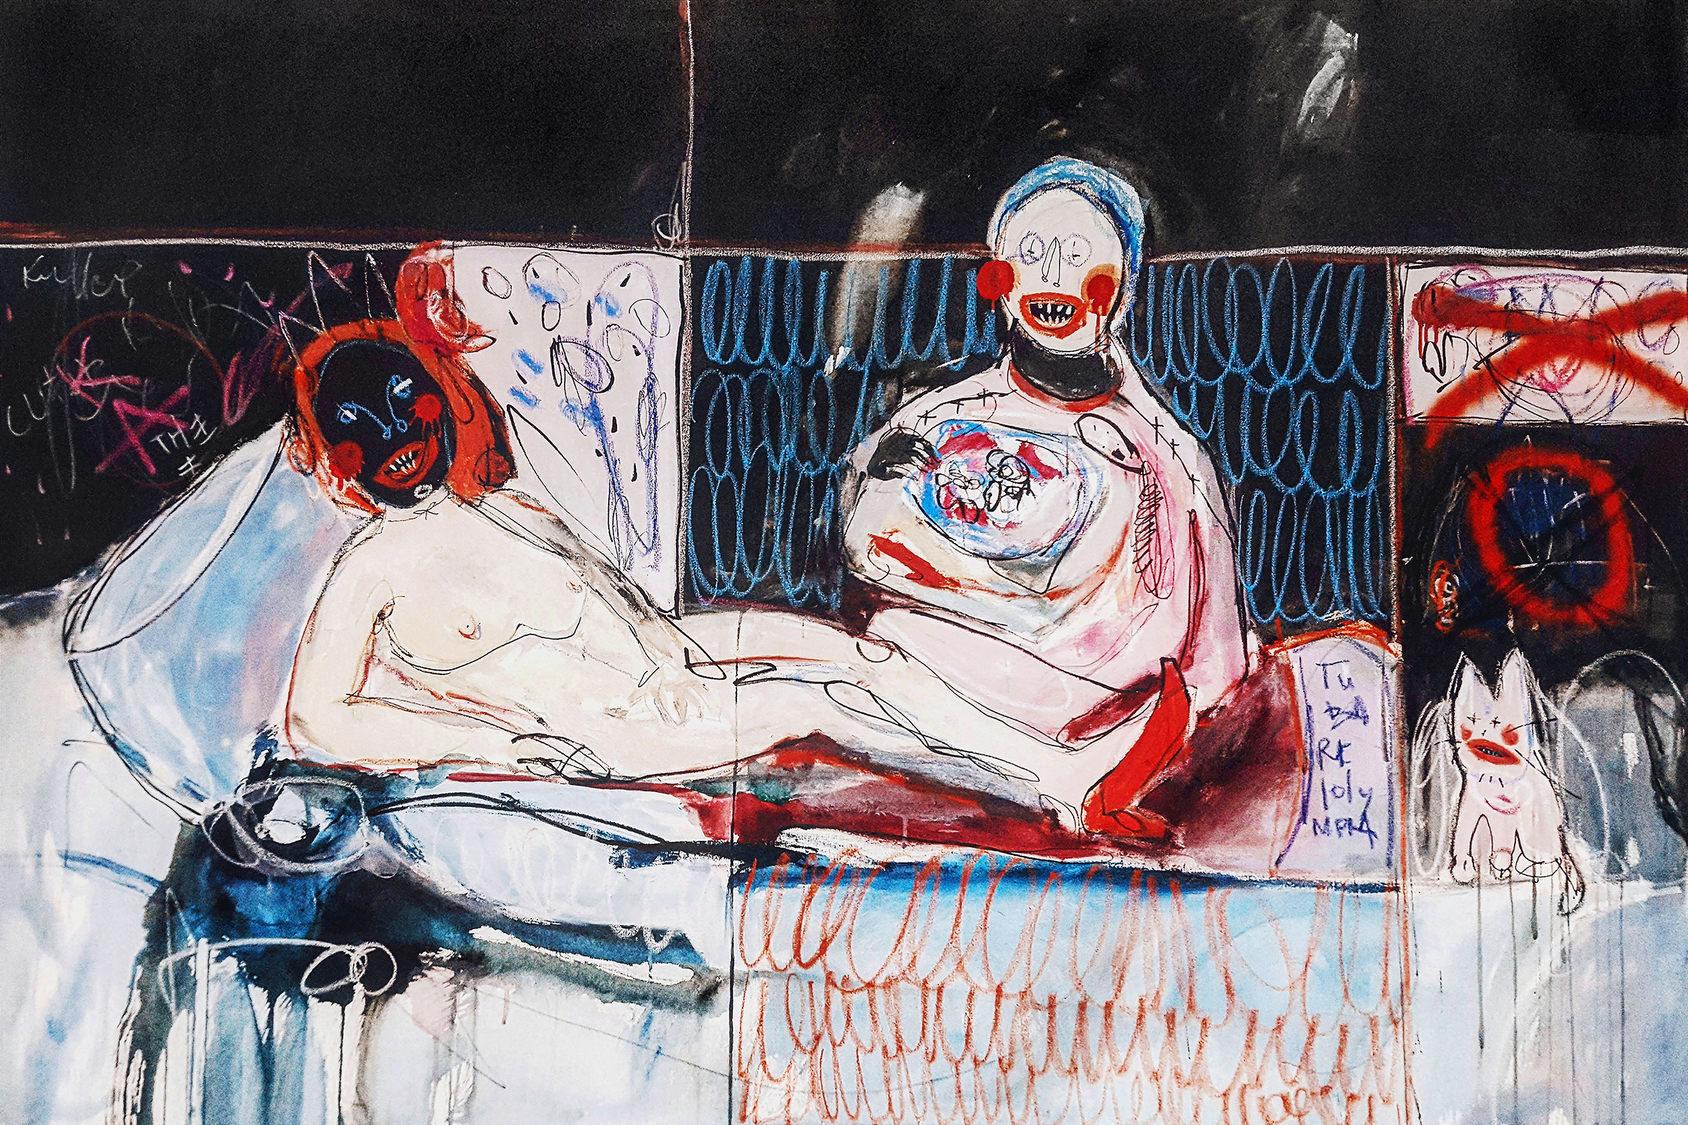 Lola , 100x150cm, acrylic, spray paint, marker and oil pastel on canvas